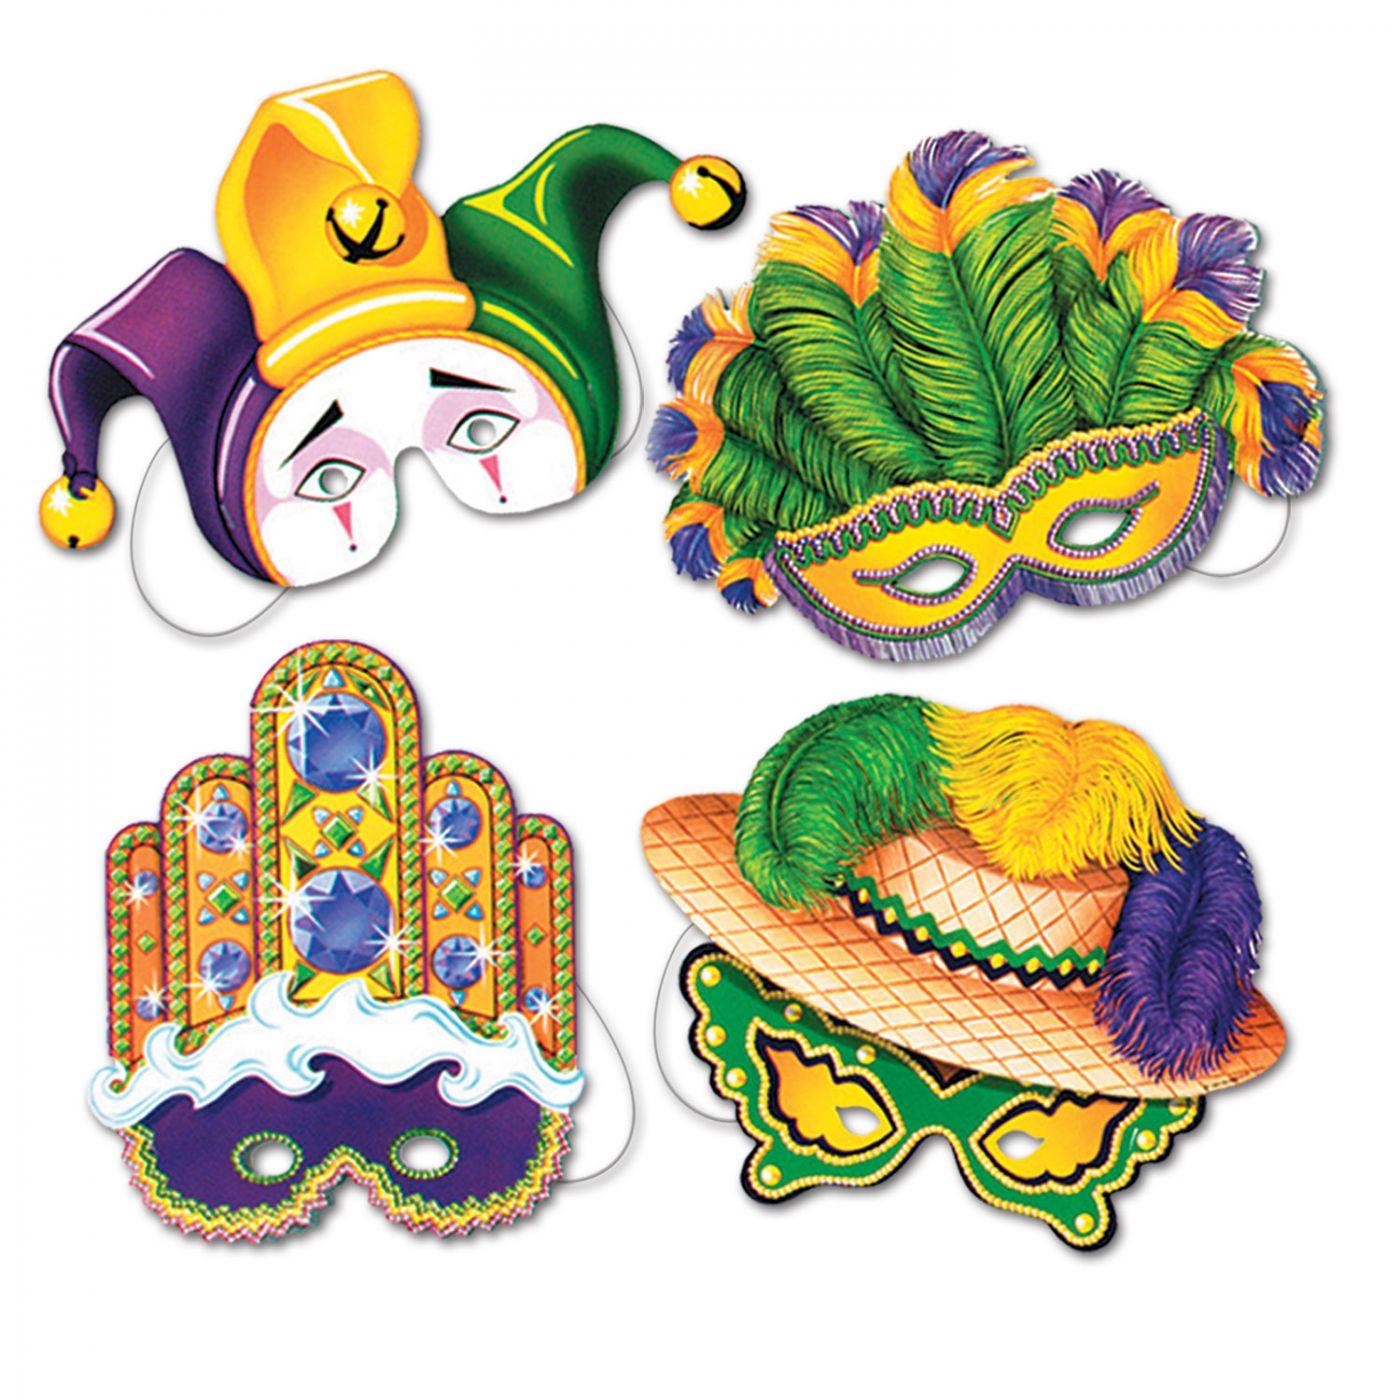 Mardi Gras Masks (24) image